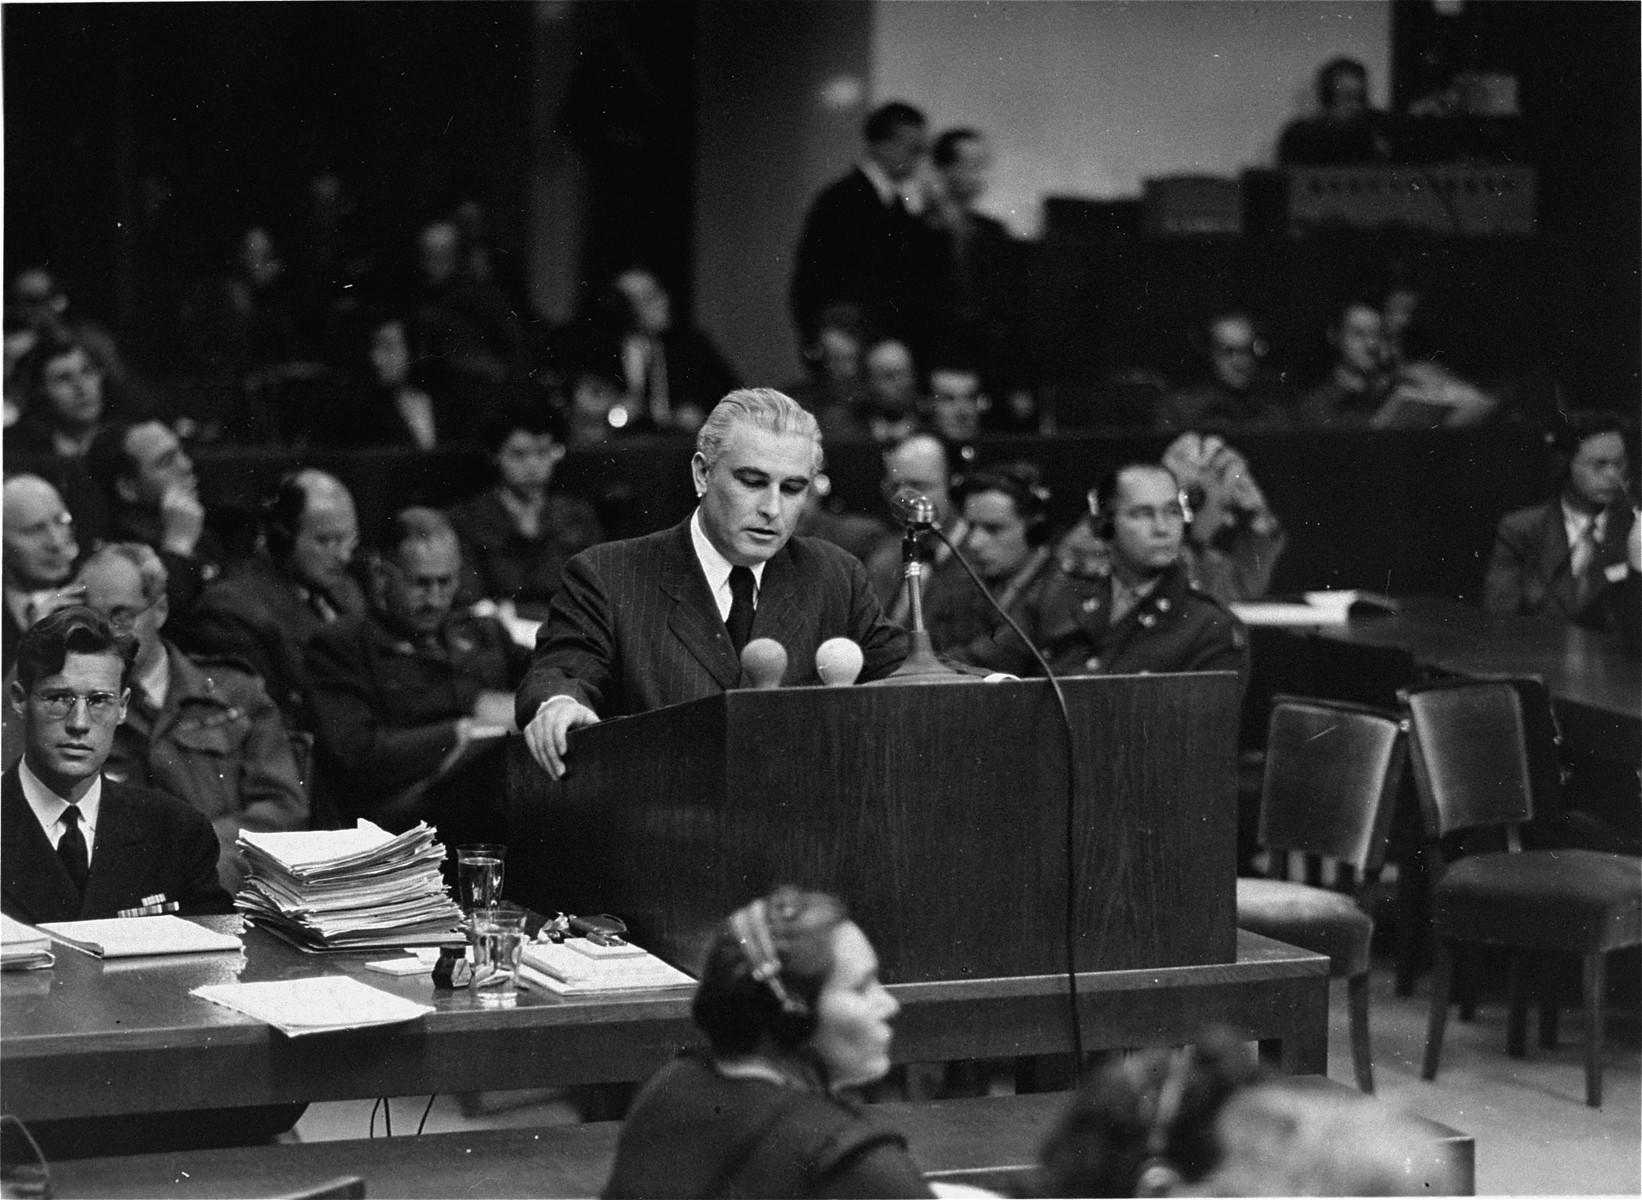 U.S. executive trial counsel Thomas J. Dodd speaks at the International Military Tribunal trial of war criminals at Nuremberg.